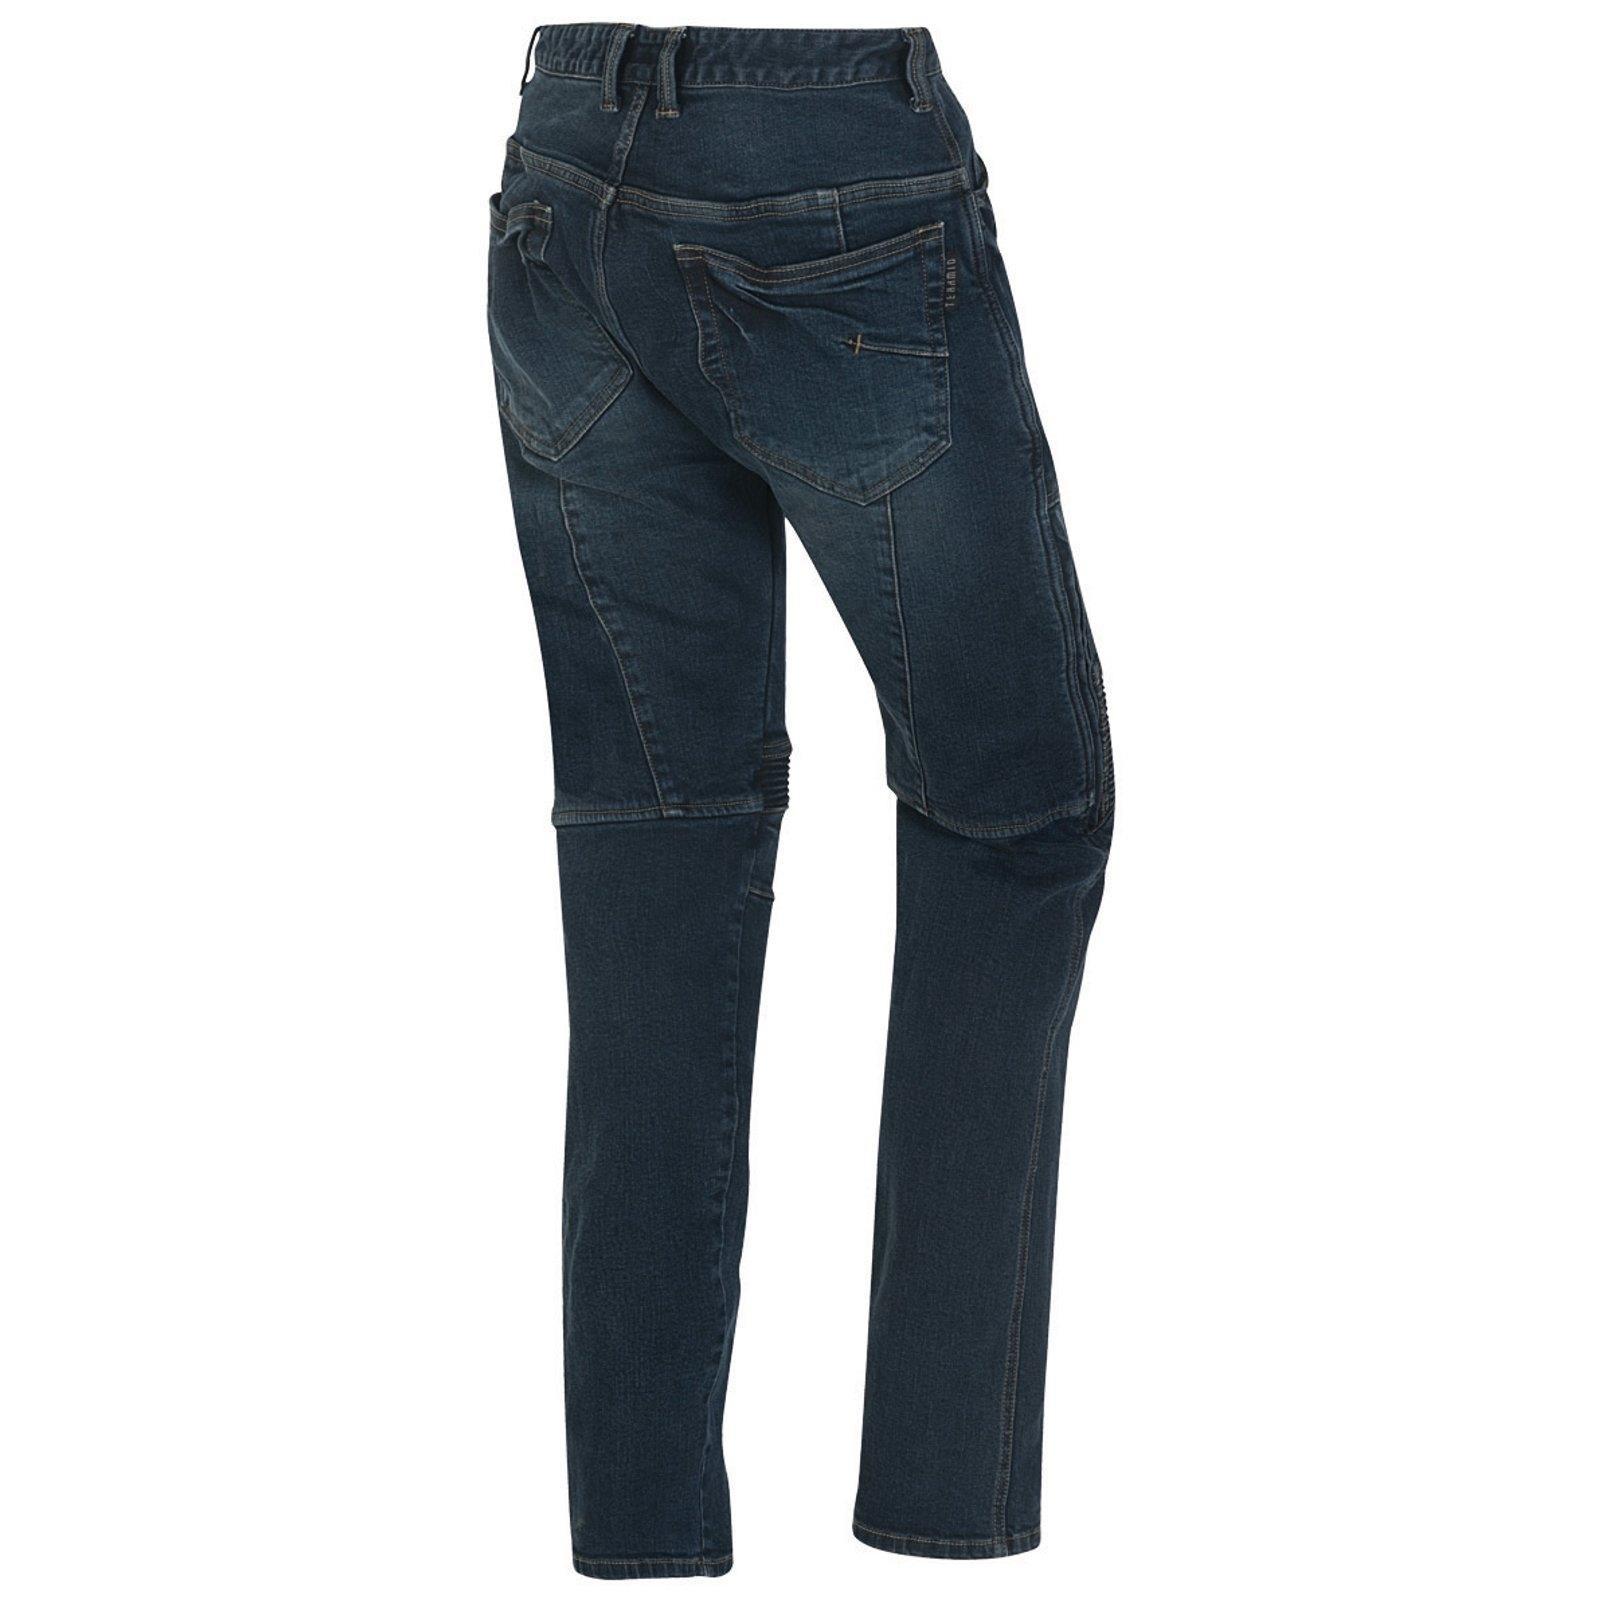 germot joe motorrad jeans herren blau l32 slimfit style. Black Bedroom Furniture Sets. Home Design Ideas